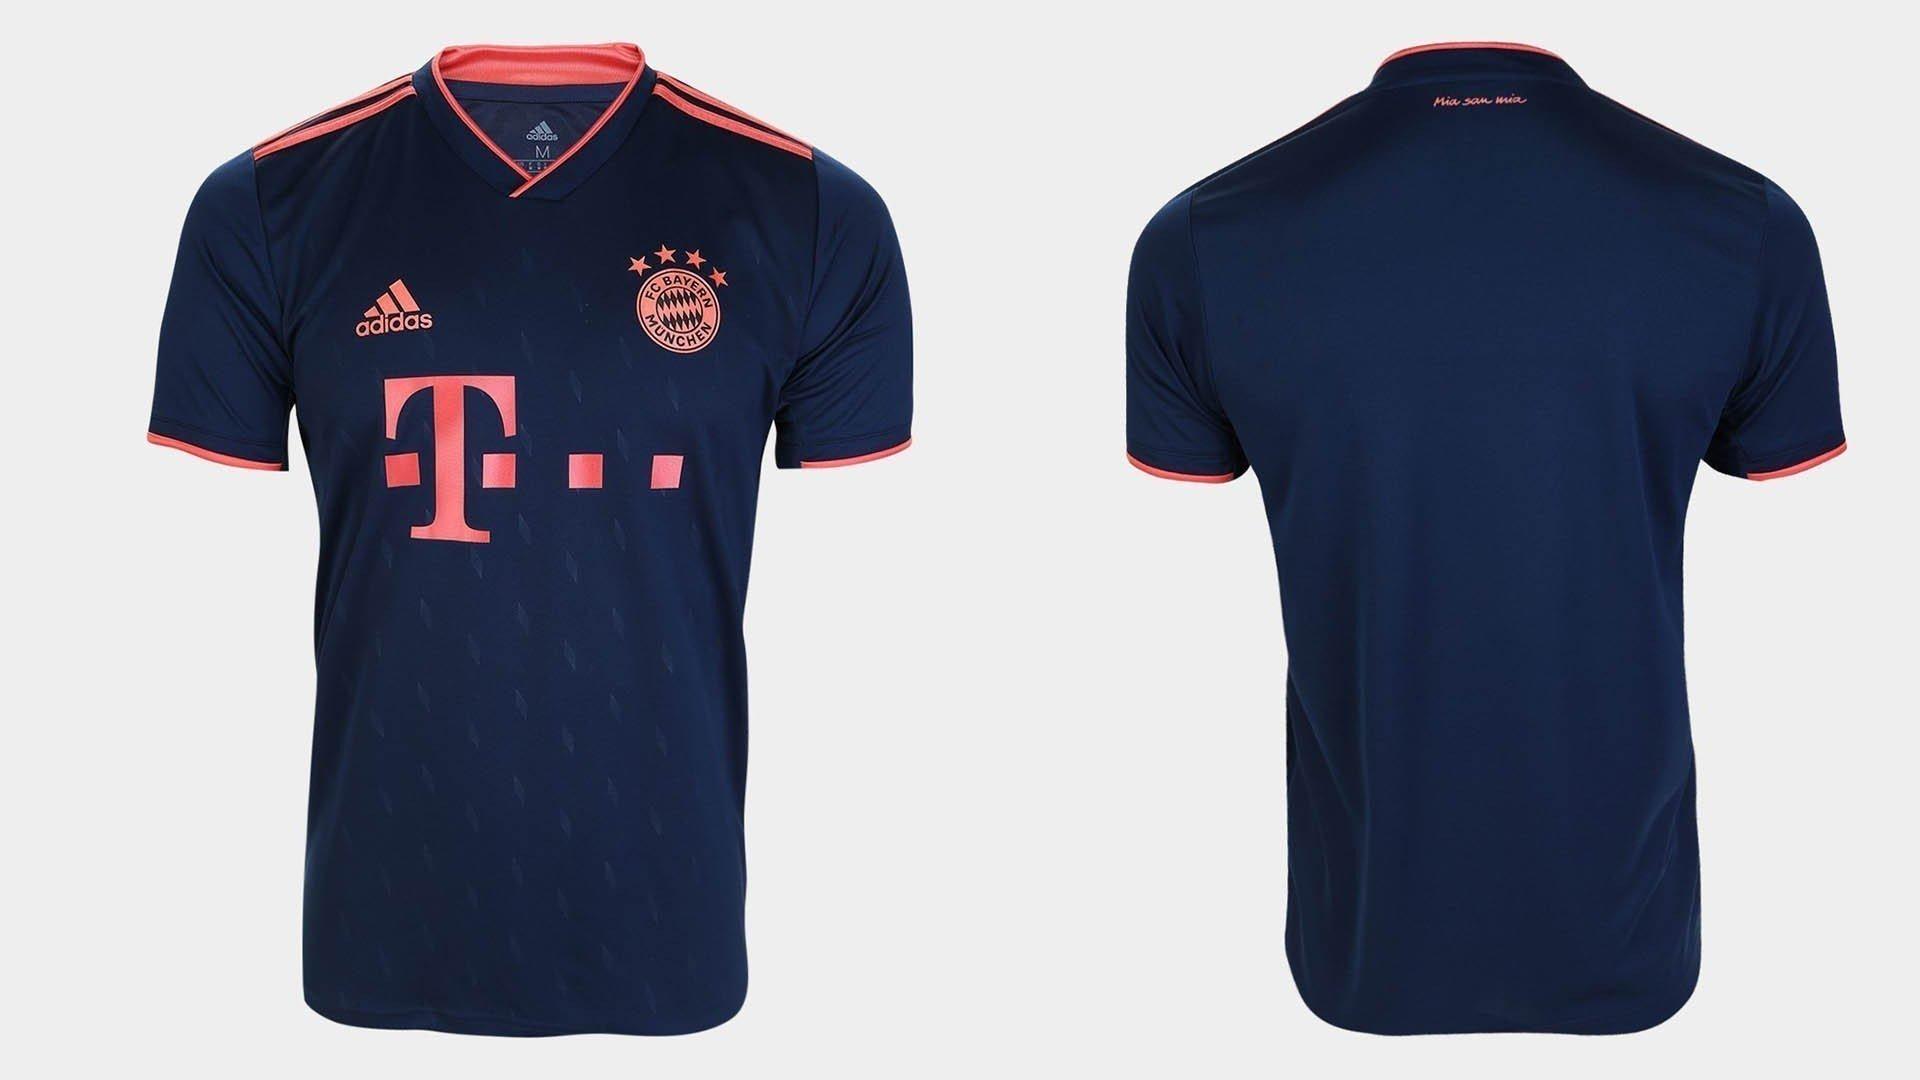 terceiro uniforme bayern 2019 20